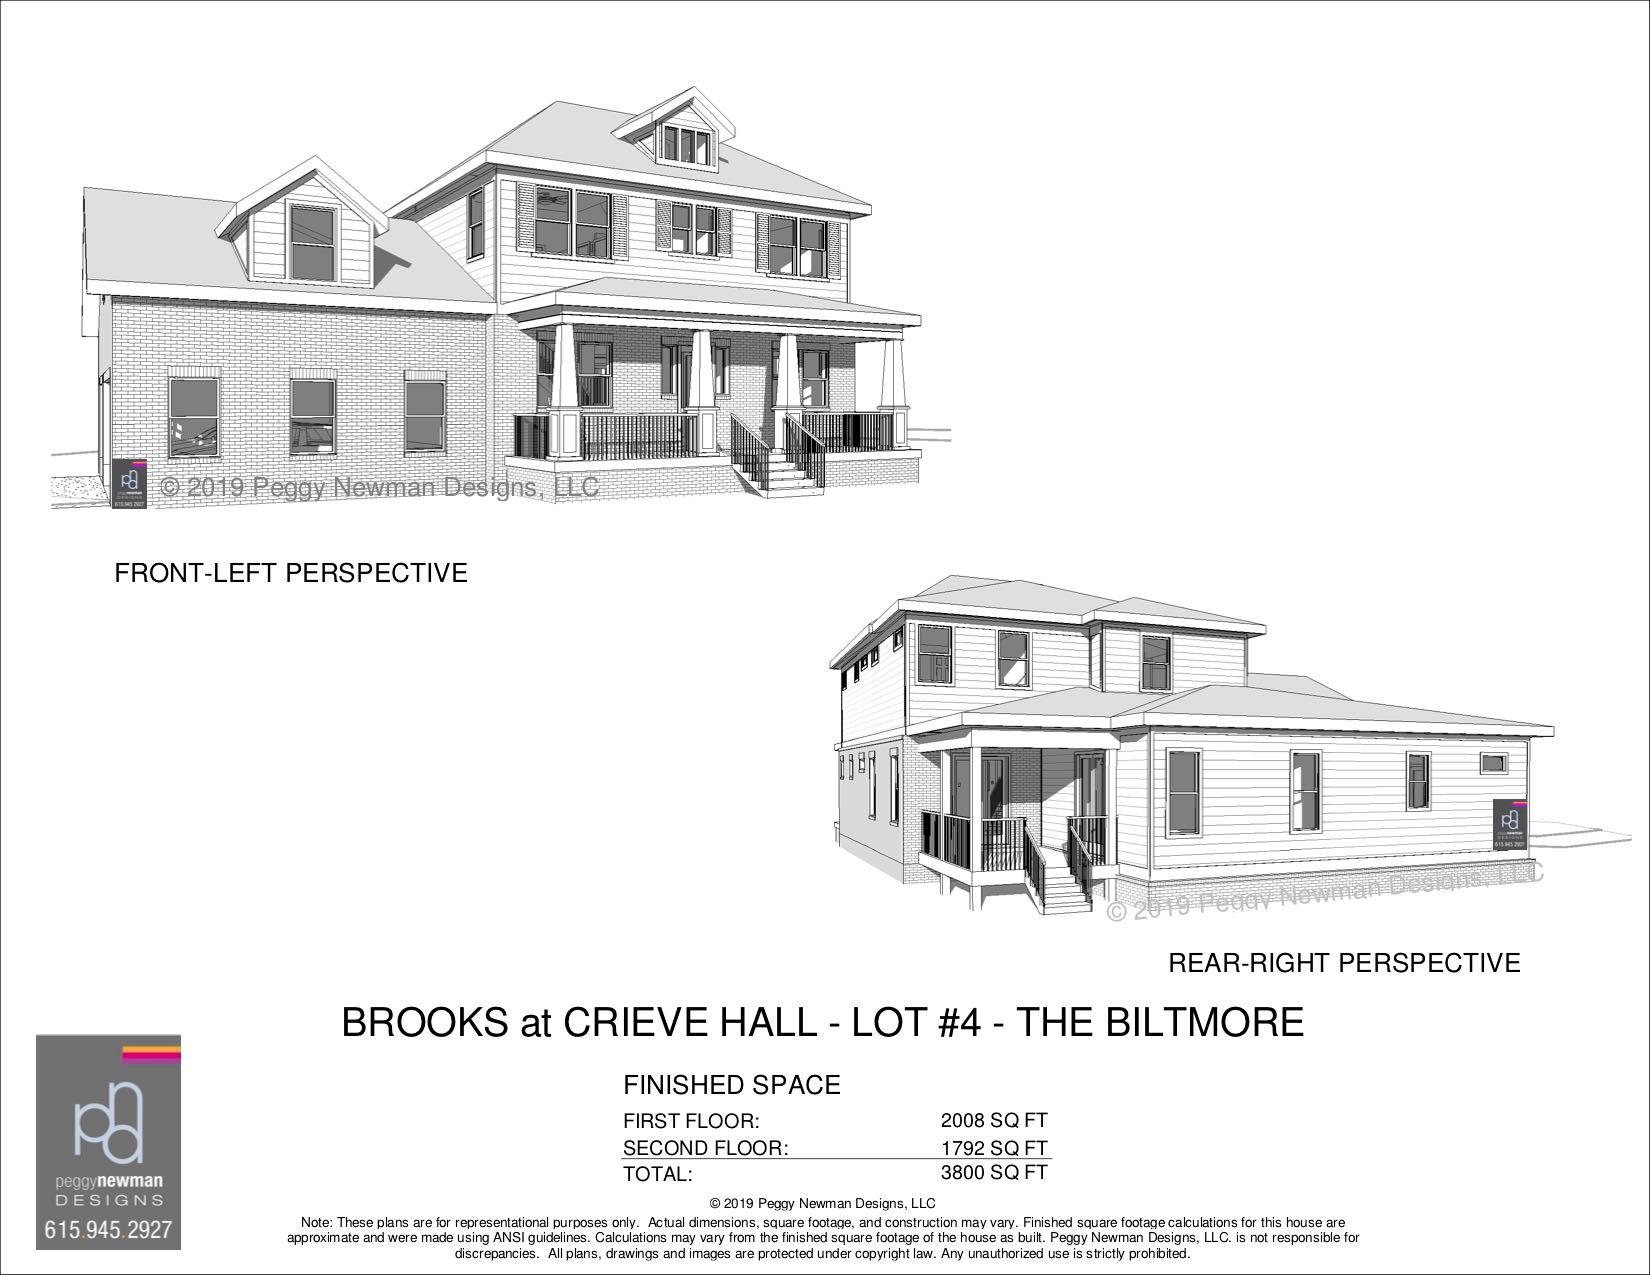 BILTMORE - Brooks at Crieve Hall - Lot 4